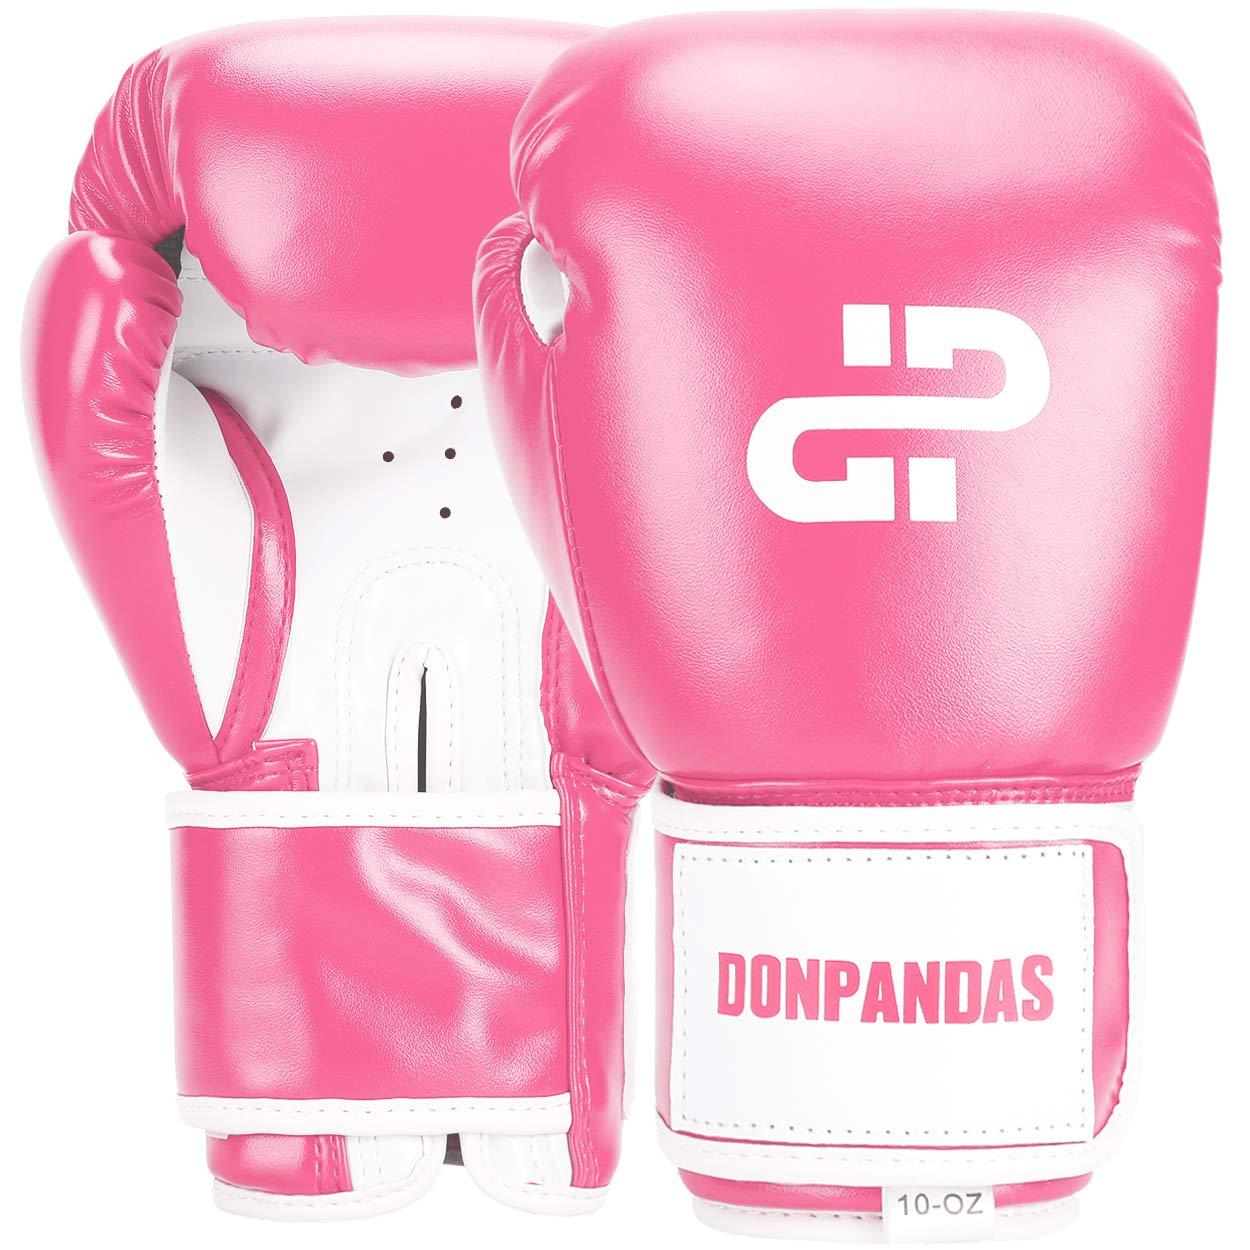 Donpandas ボクシンググローブ レディース&メンズ パンチングヘビーバッググローブ エッセンシャル ジェル ボクシング キックボクシング スパーリング ムエタイ トレーニンググローブ 10 oz ピンク